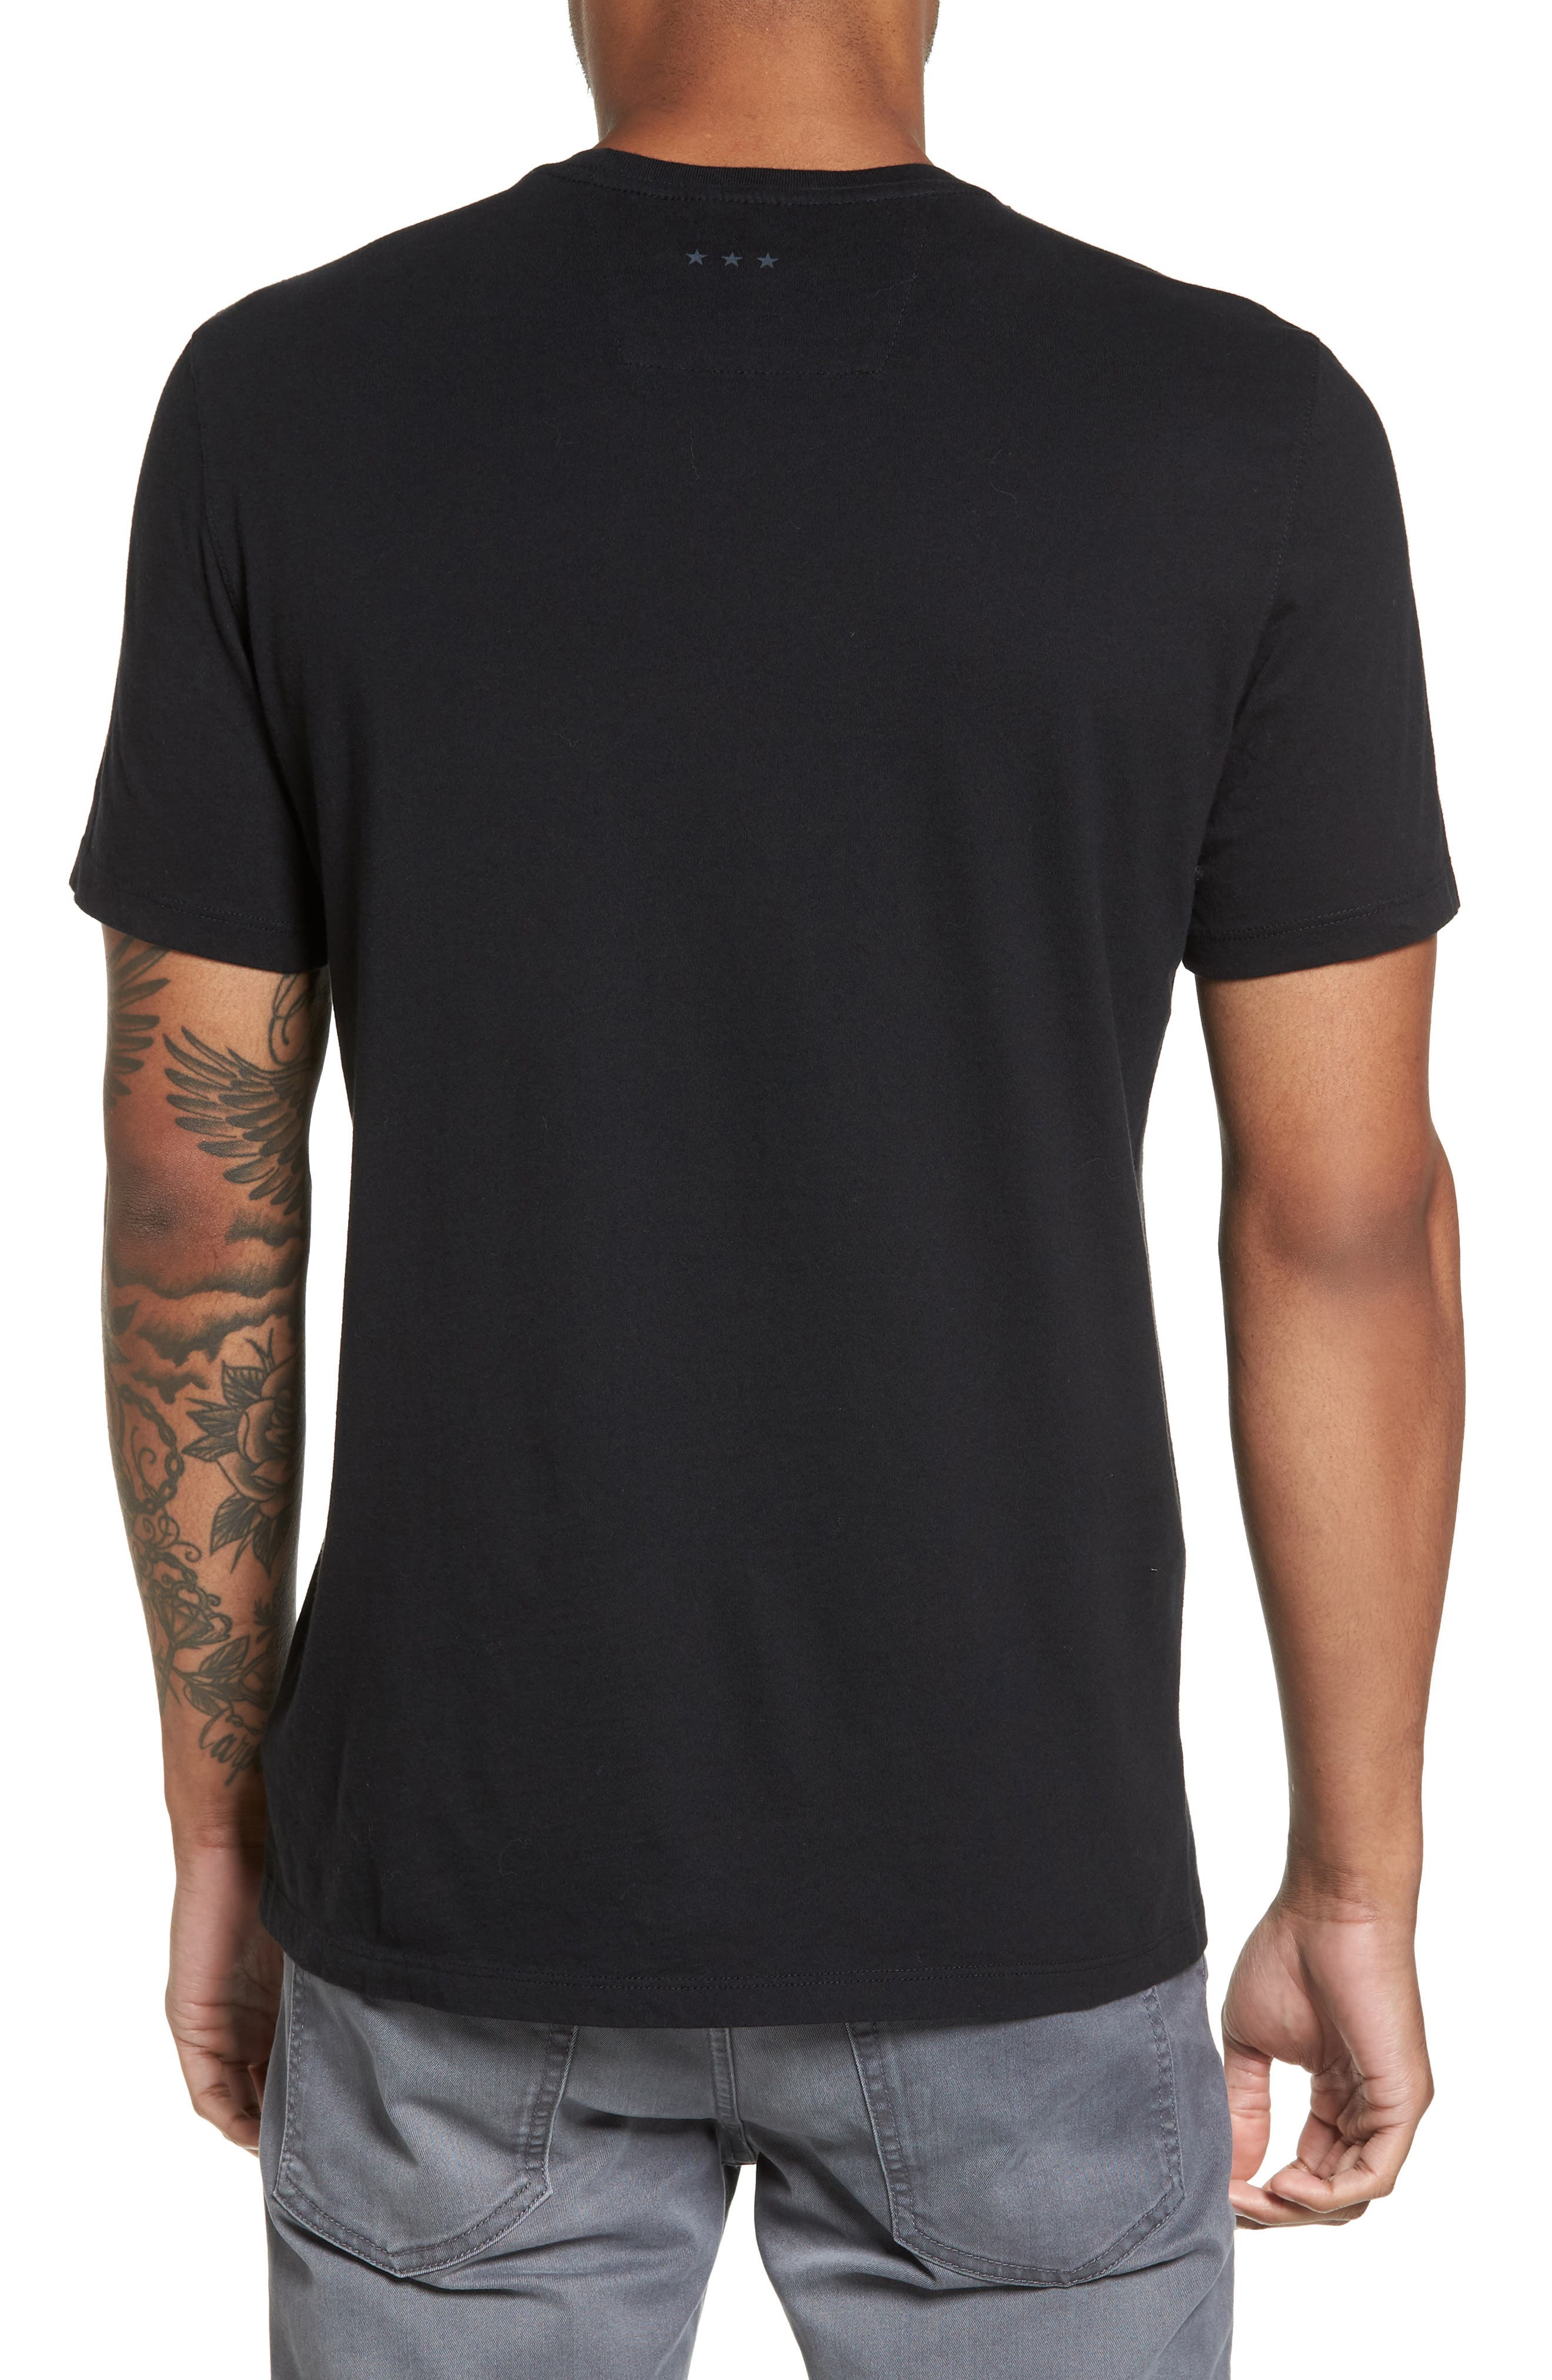 John Varvatos Guns N' Roses Graphic T-Shirt,                             Alternate thumbnail 2, color,                             001